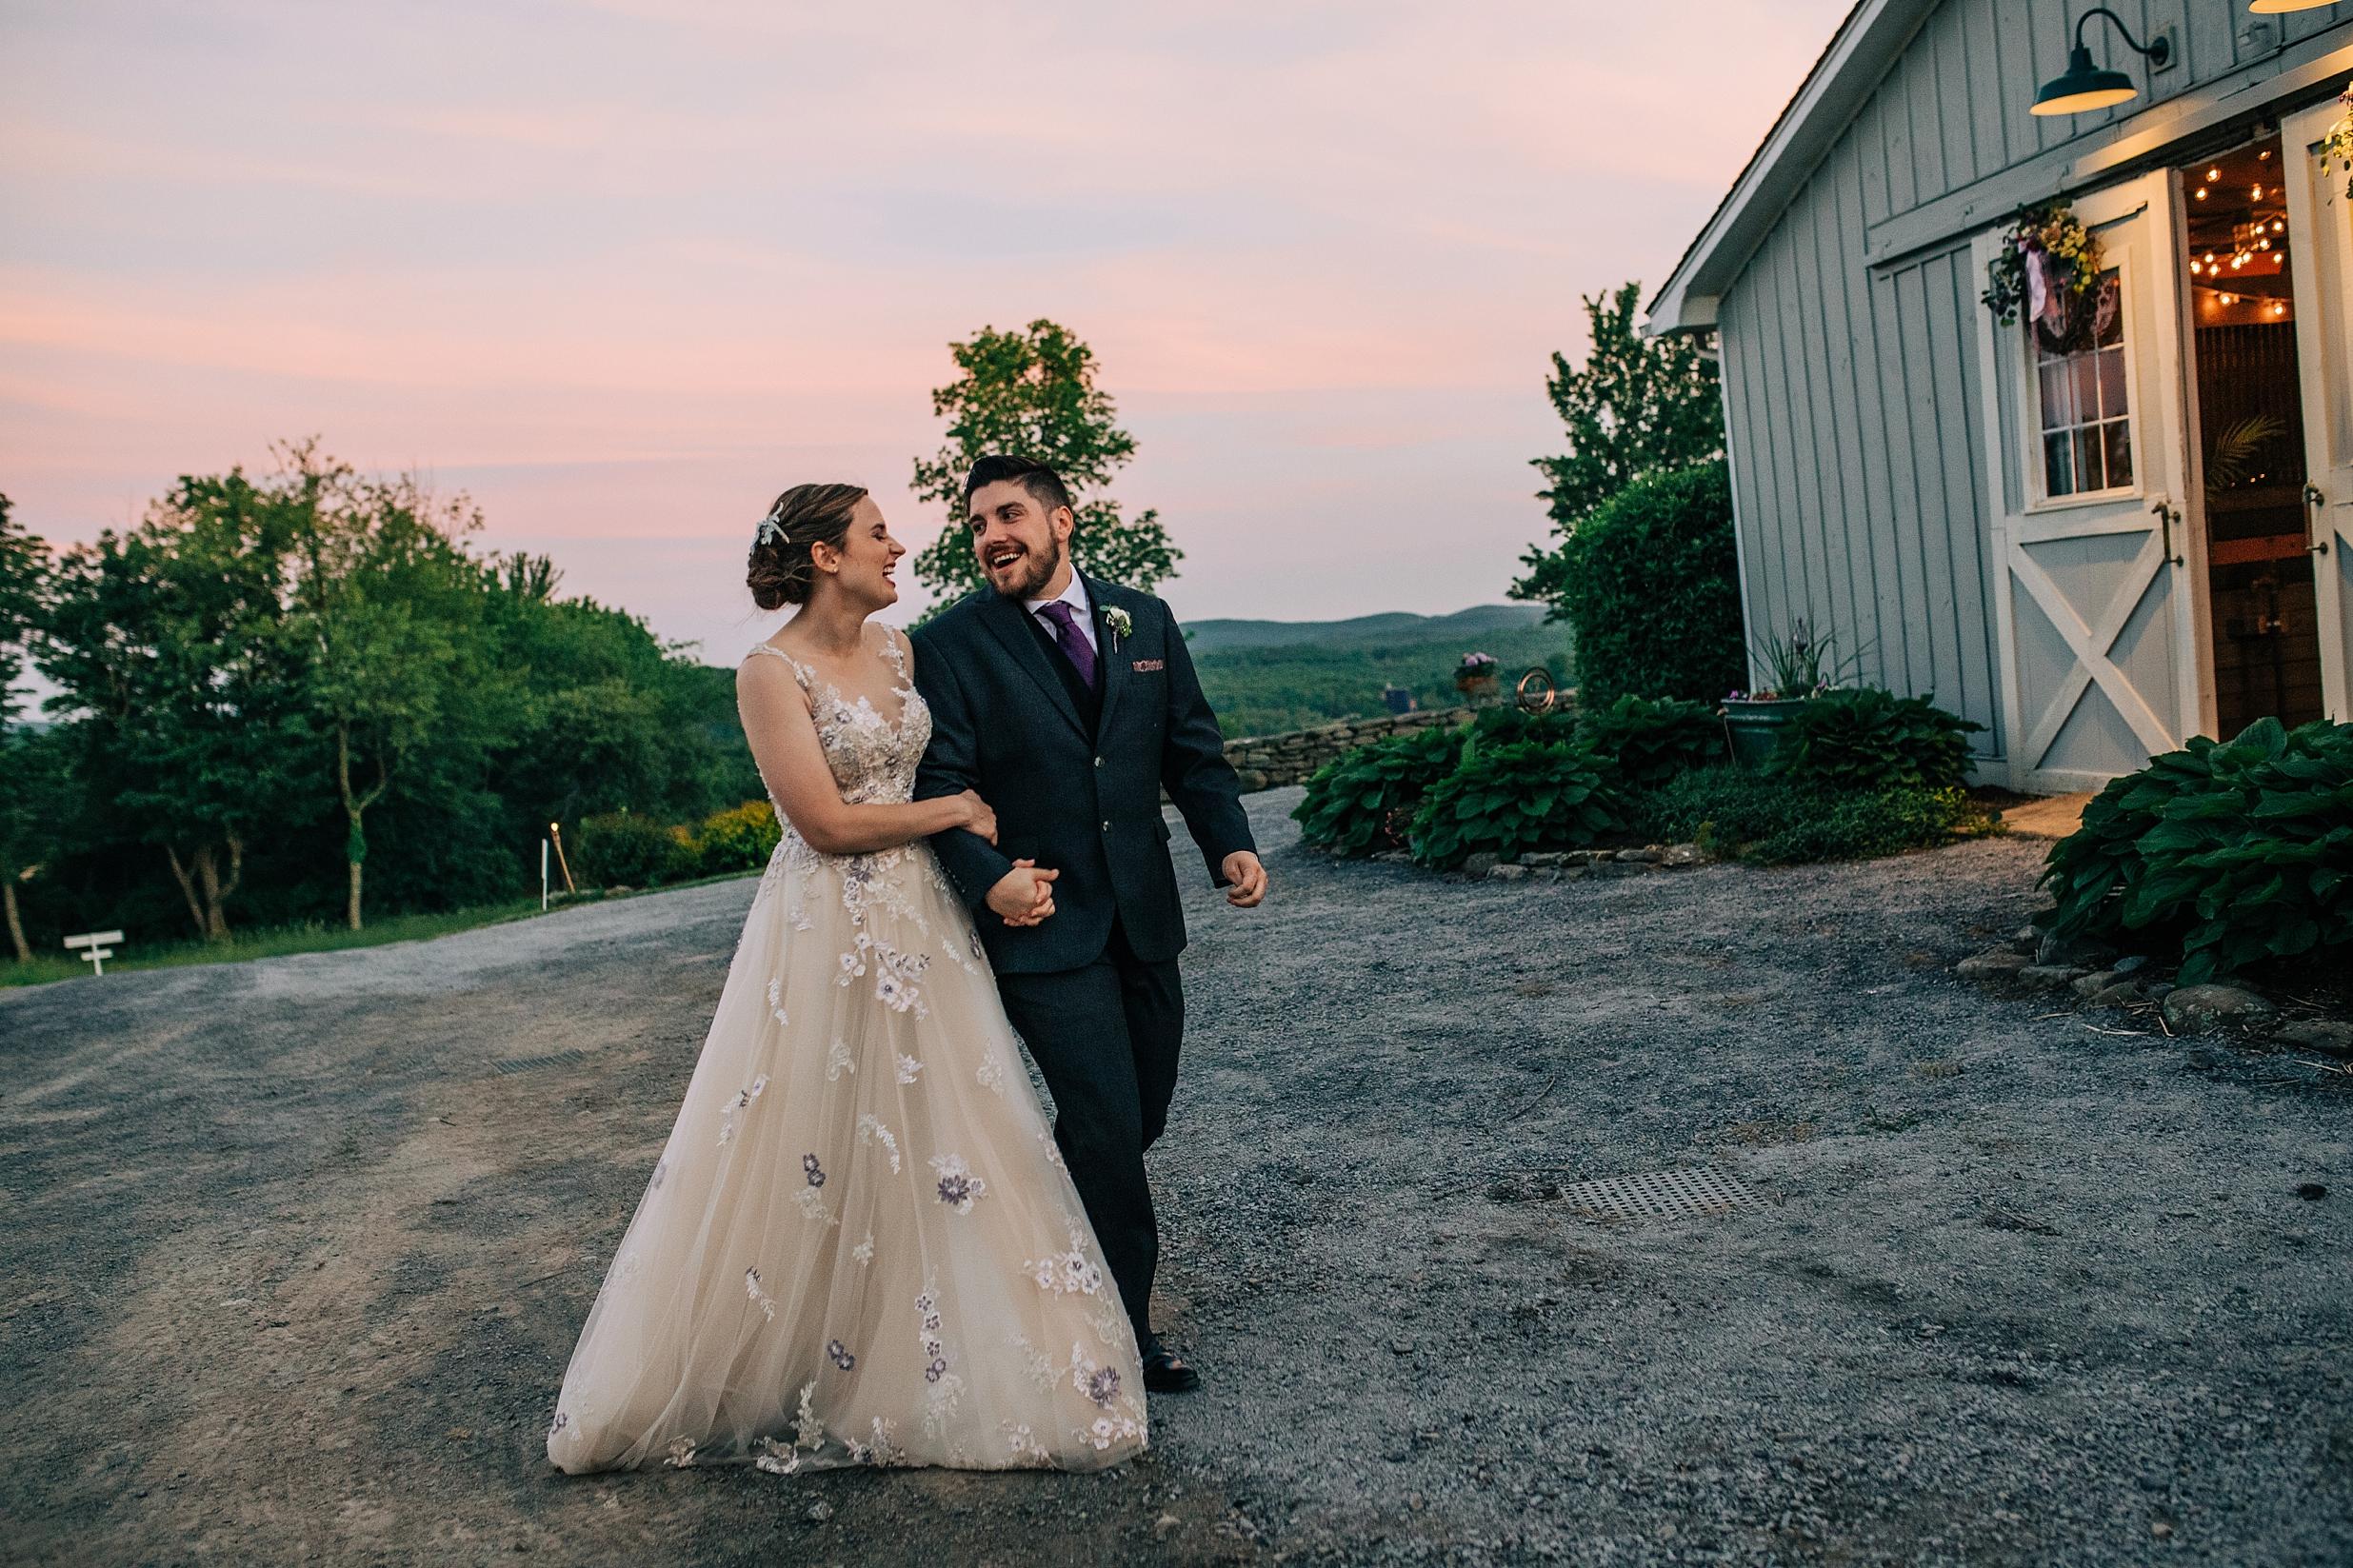 historic-upstate-ny-wedding-church-backyard-photographer_0048.jpg